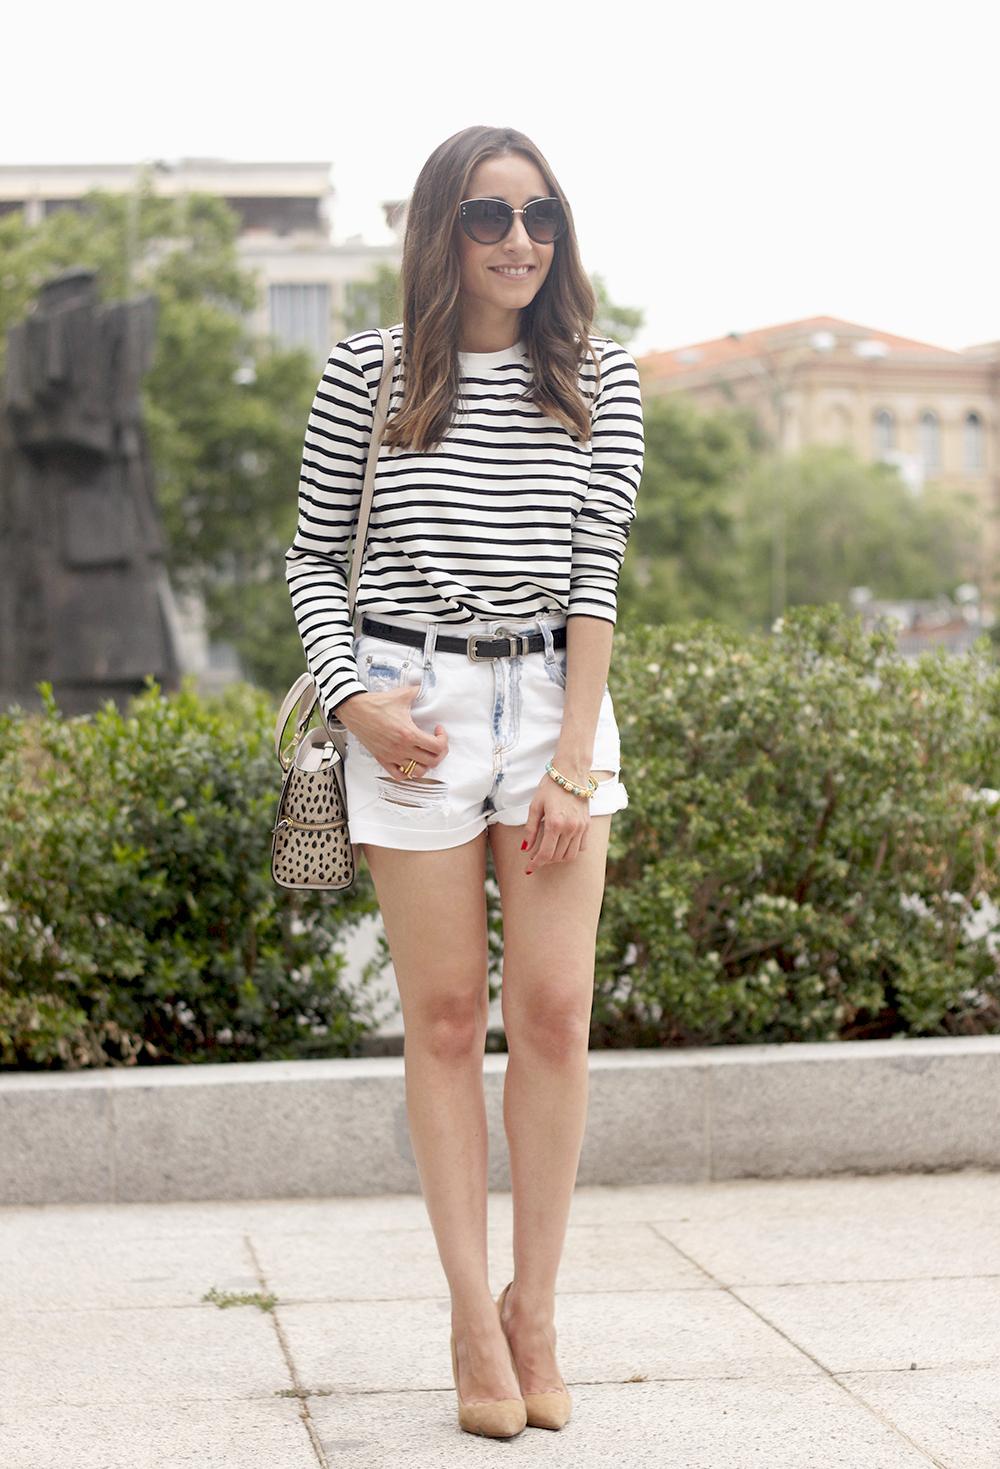 Stripes and denim shorts nude heels acosta bag sunnies belt summer outfit07